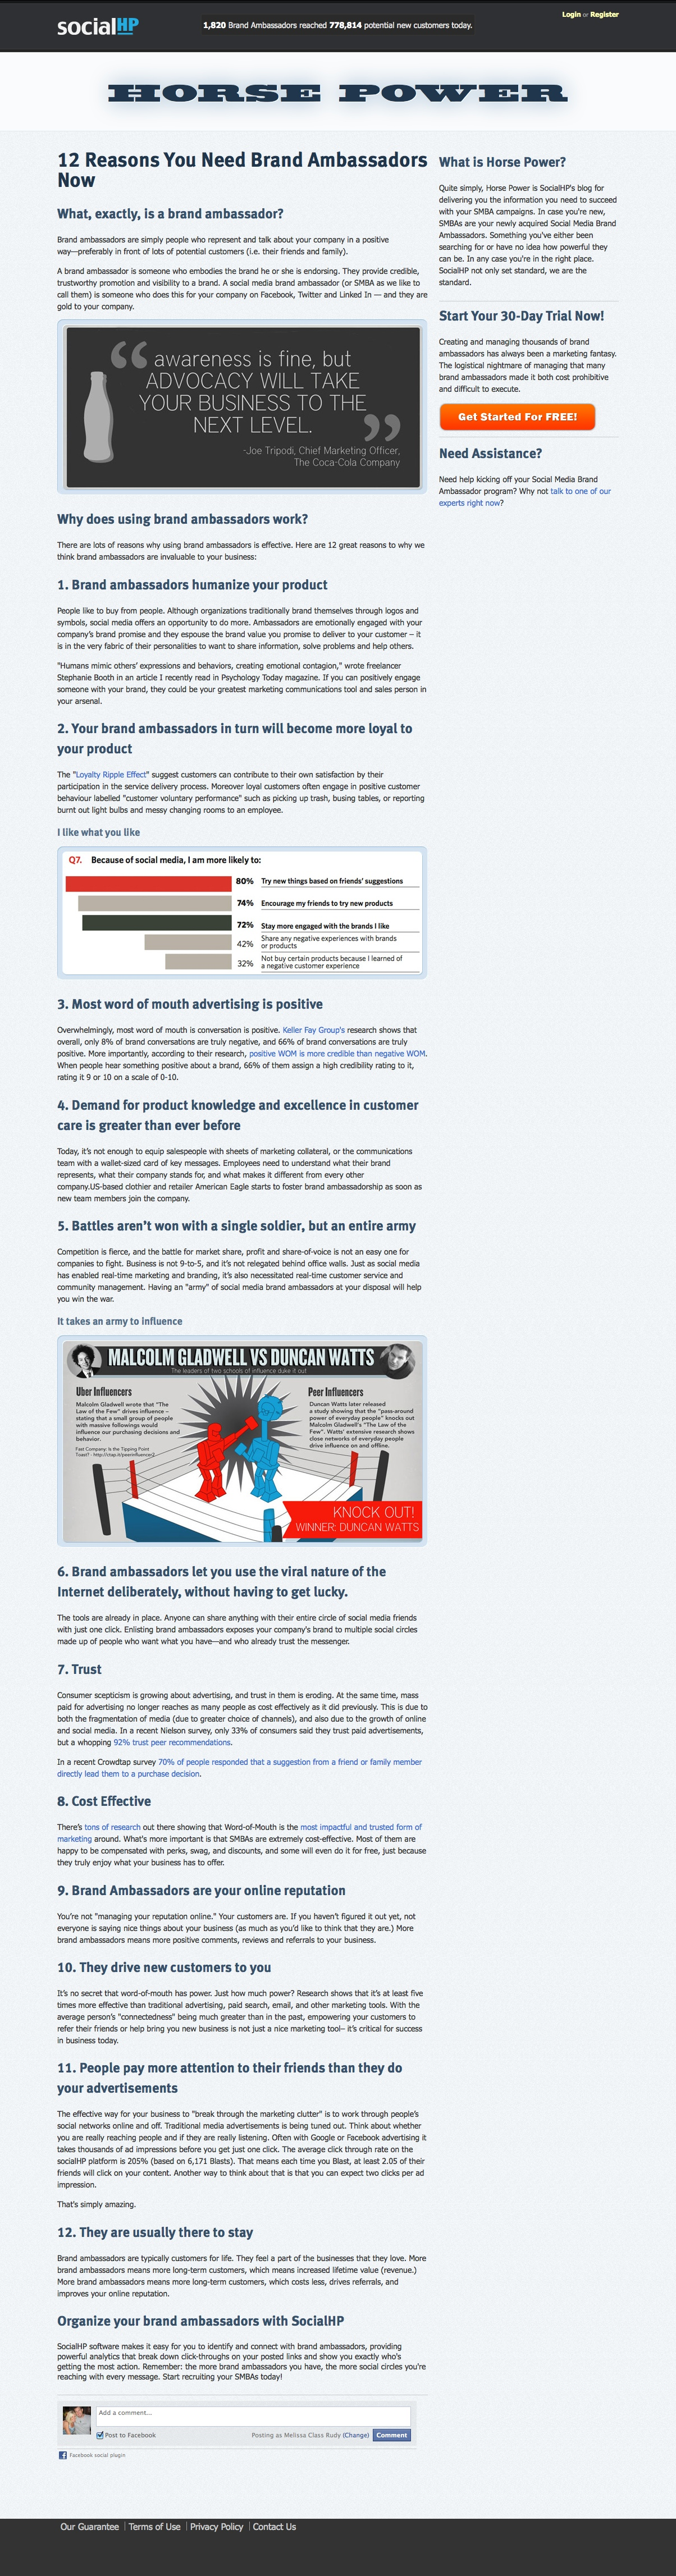 Marketing Article: socialHP